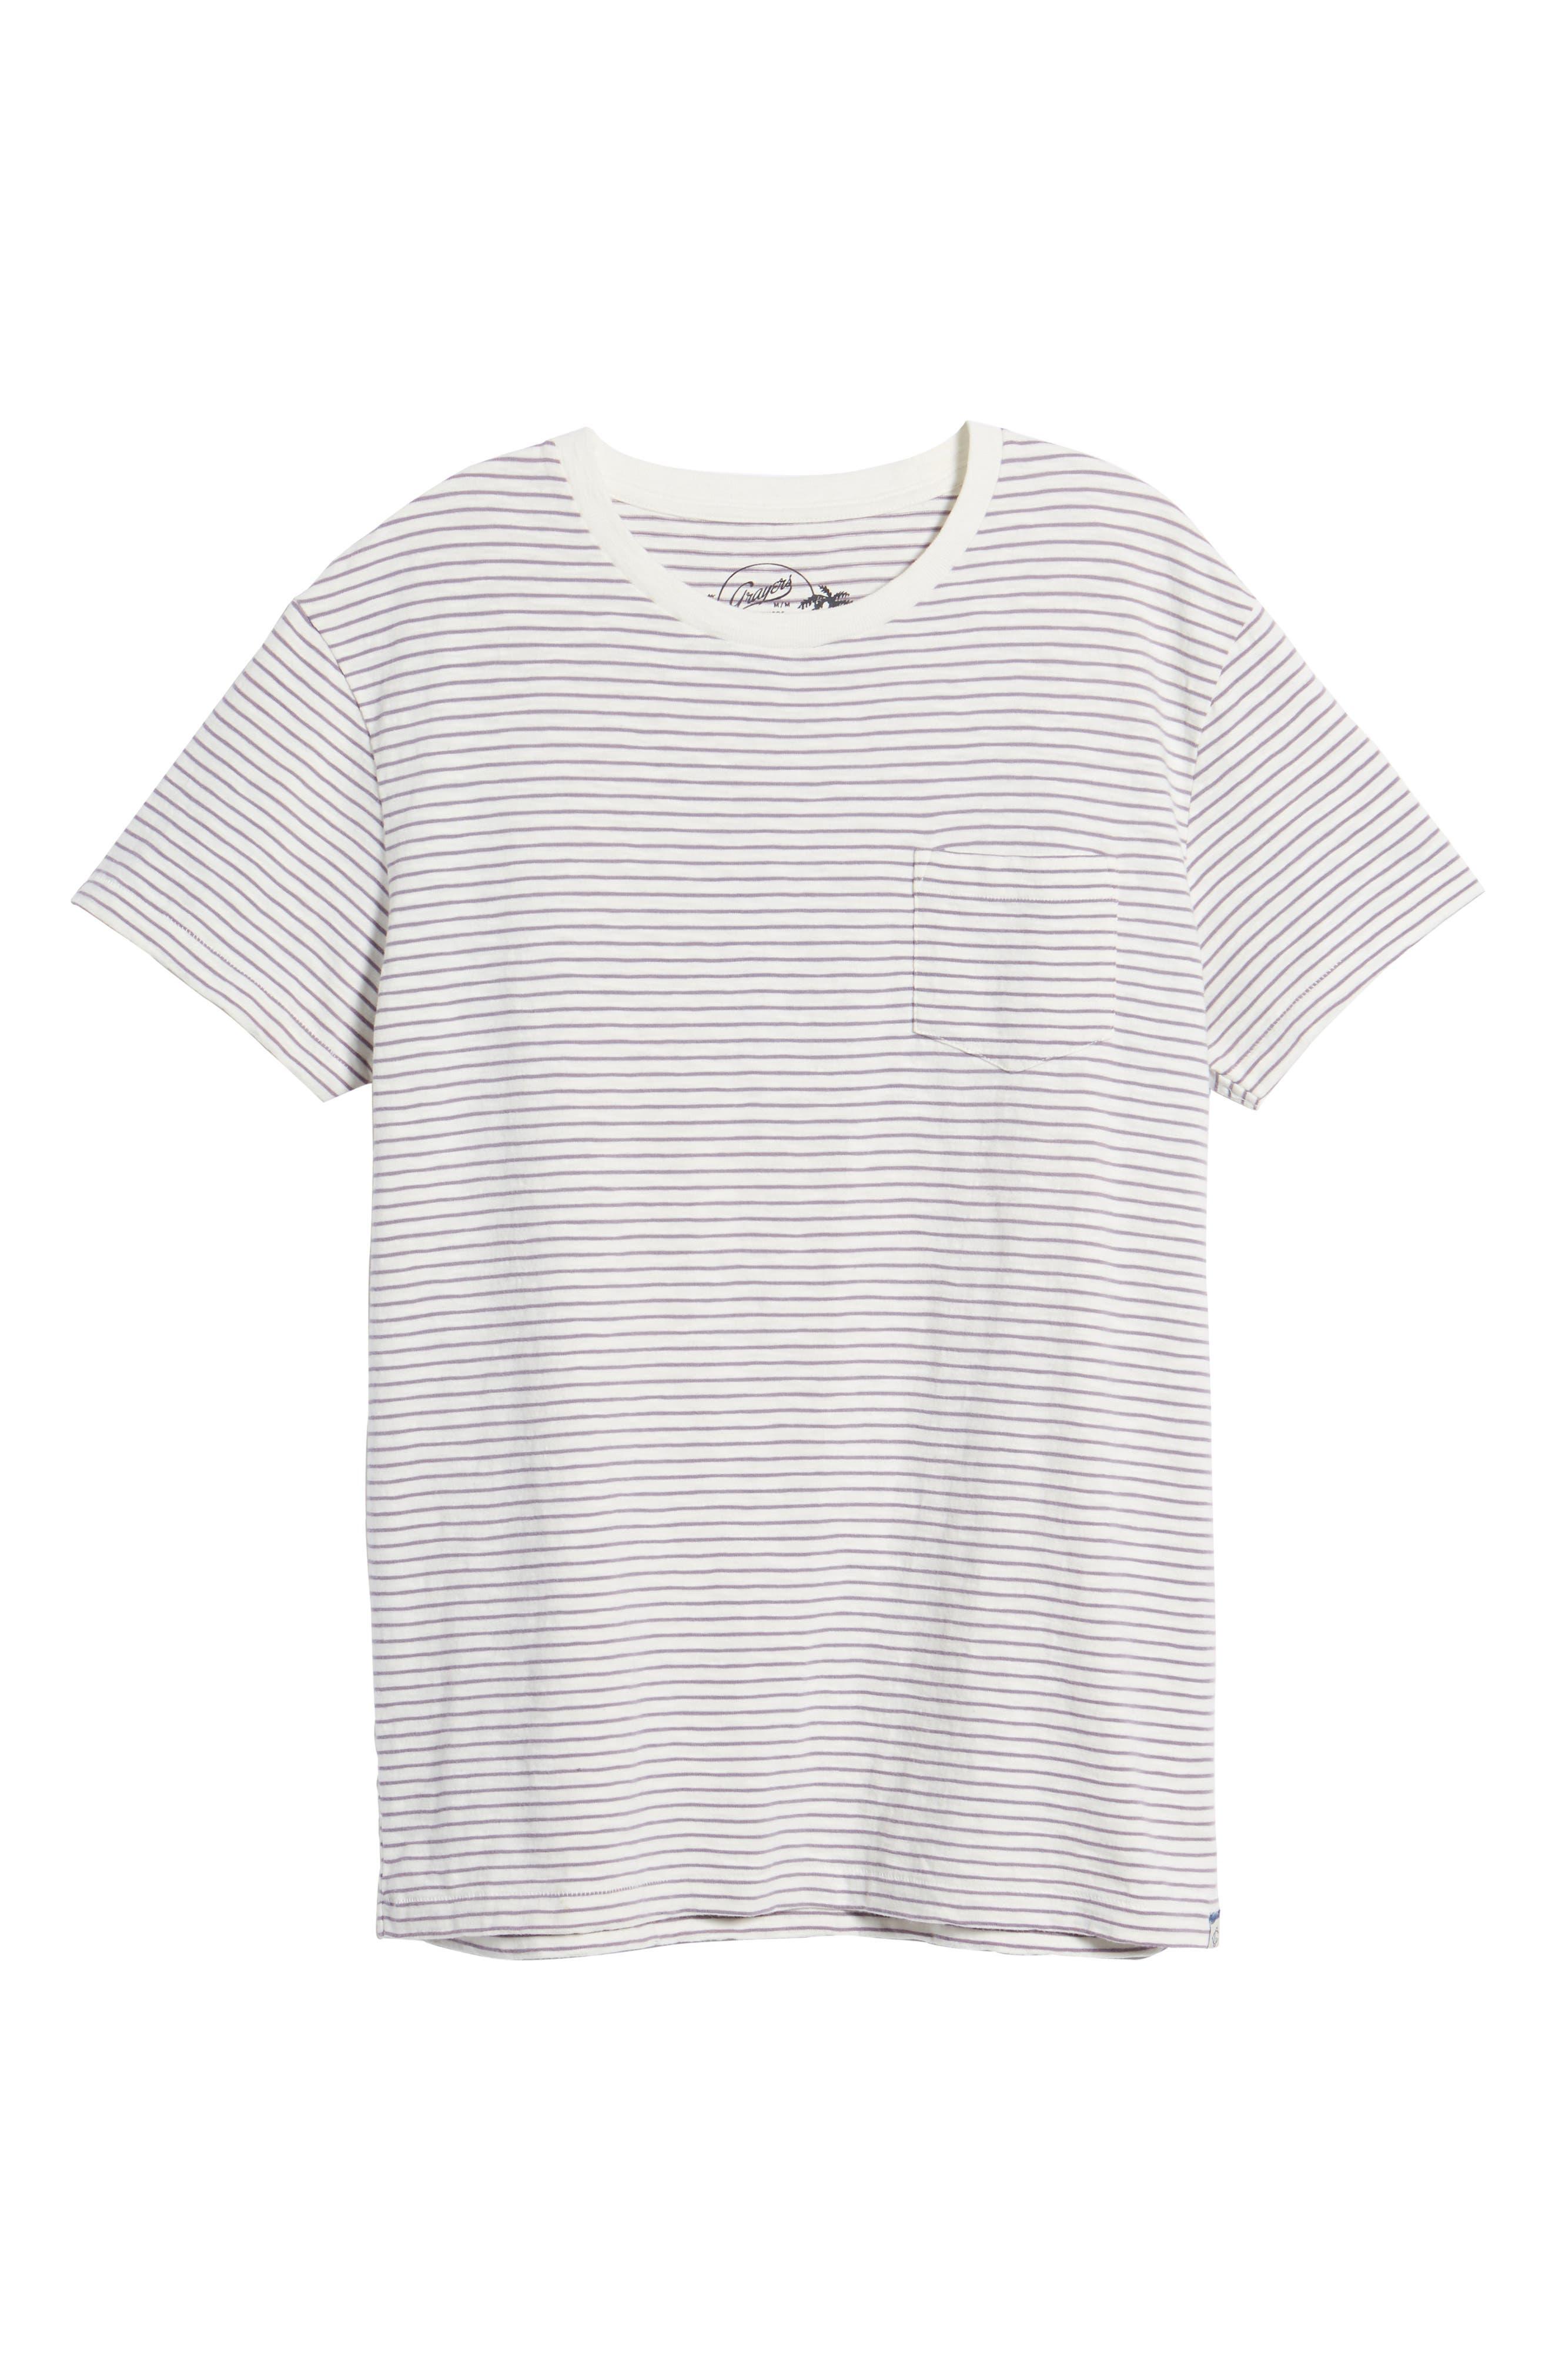 Malaga Cove Stripe T-Shirt,                             Alternate thumbnail 6, color,                             Antique White